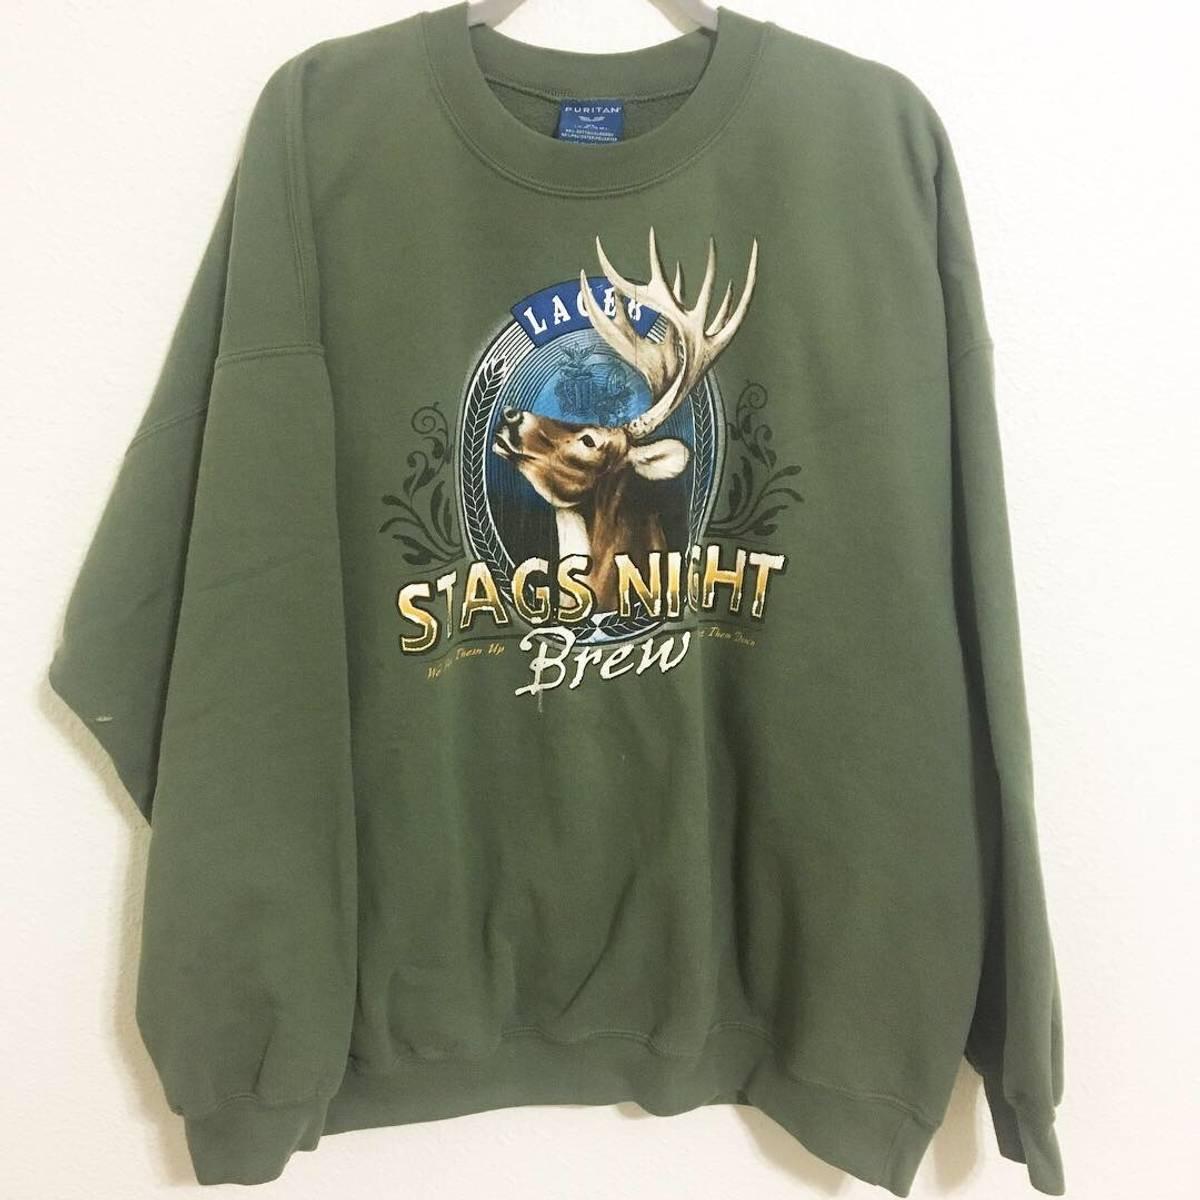 T-shirts T Birds T-shirt Grease Black Jacket T-bird John Travolta Transfer Stag Night Men